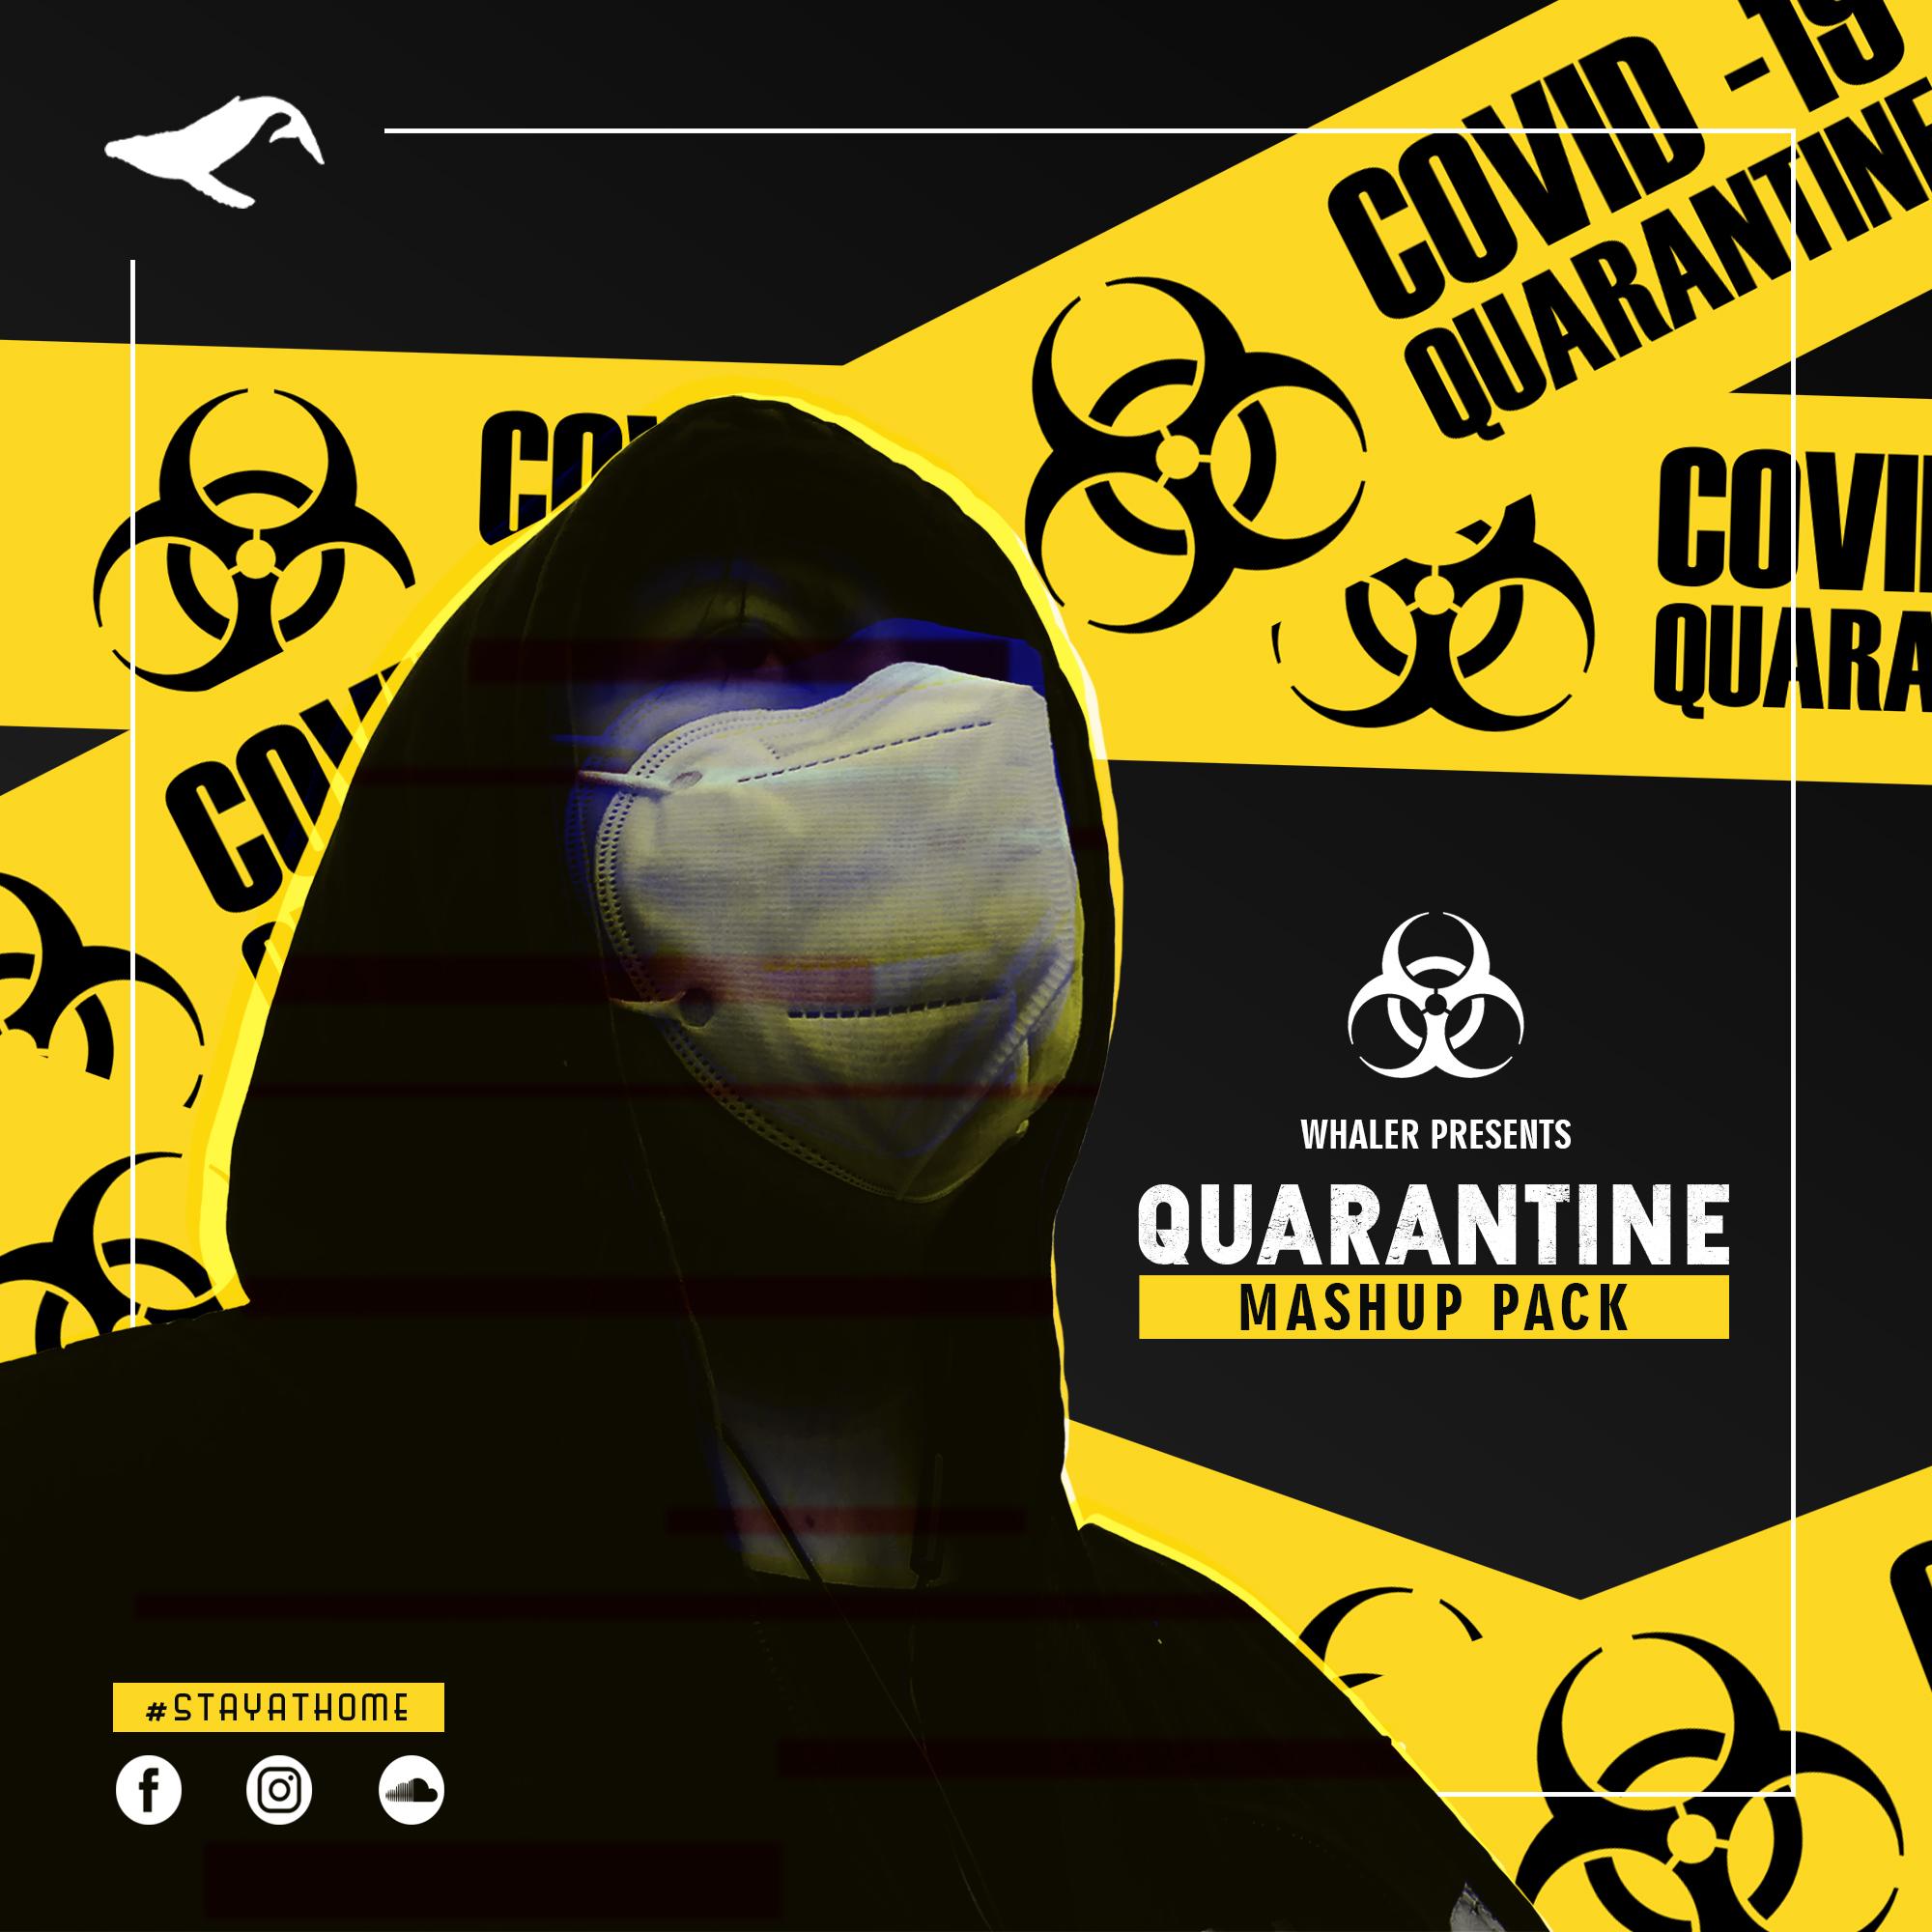 Whaler Quarantine Mashup Pack 2020